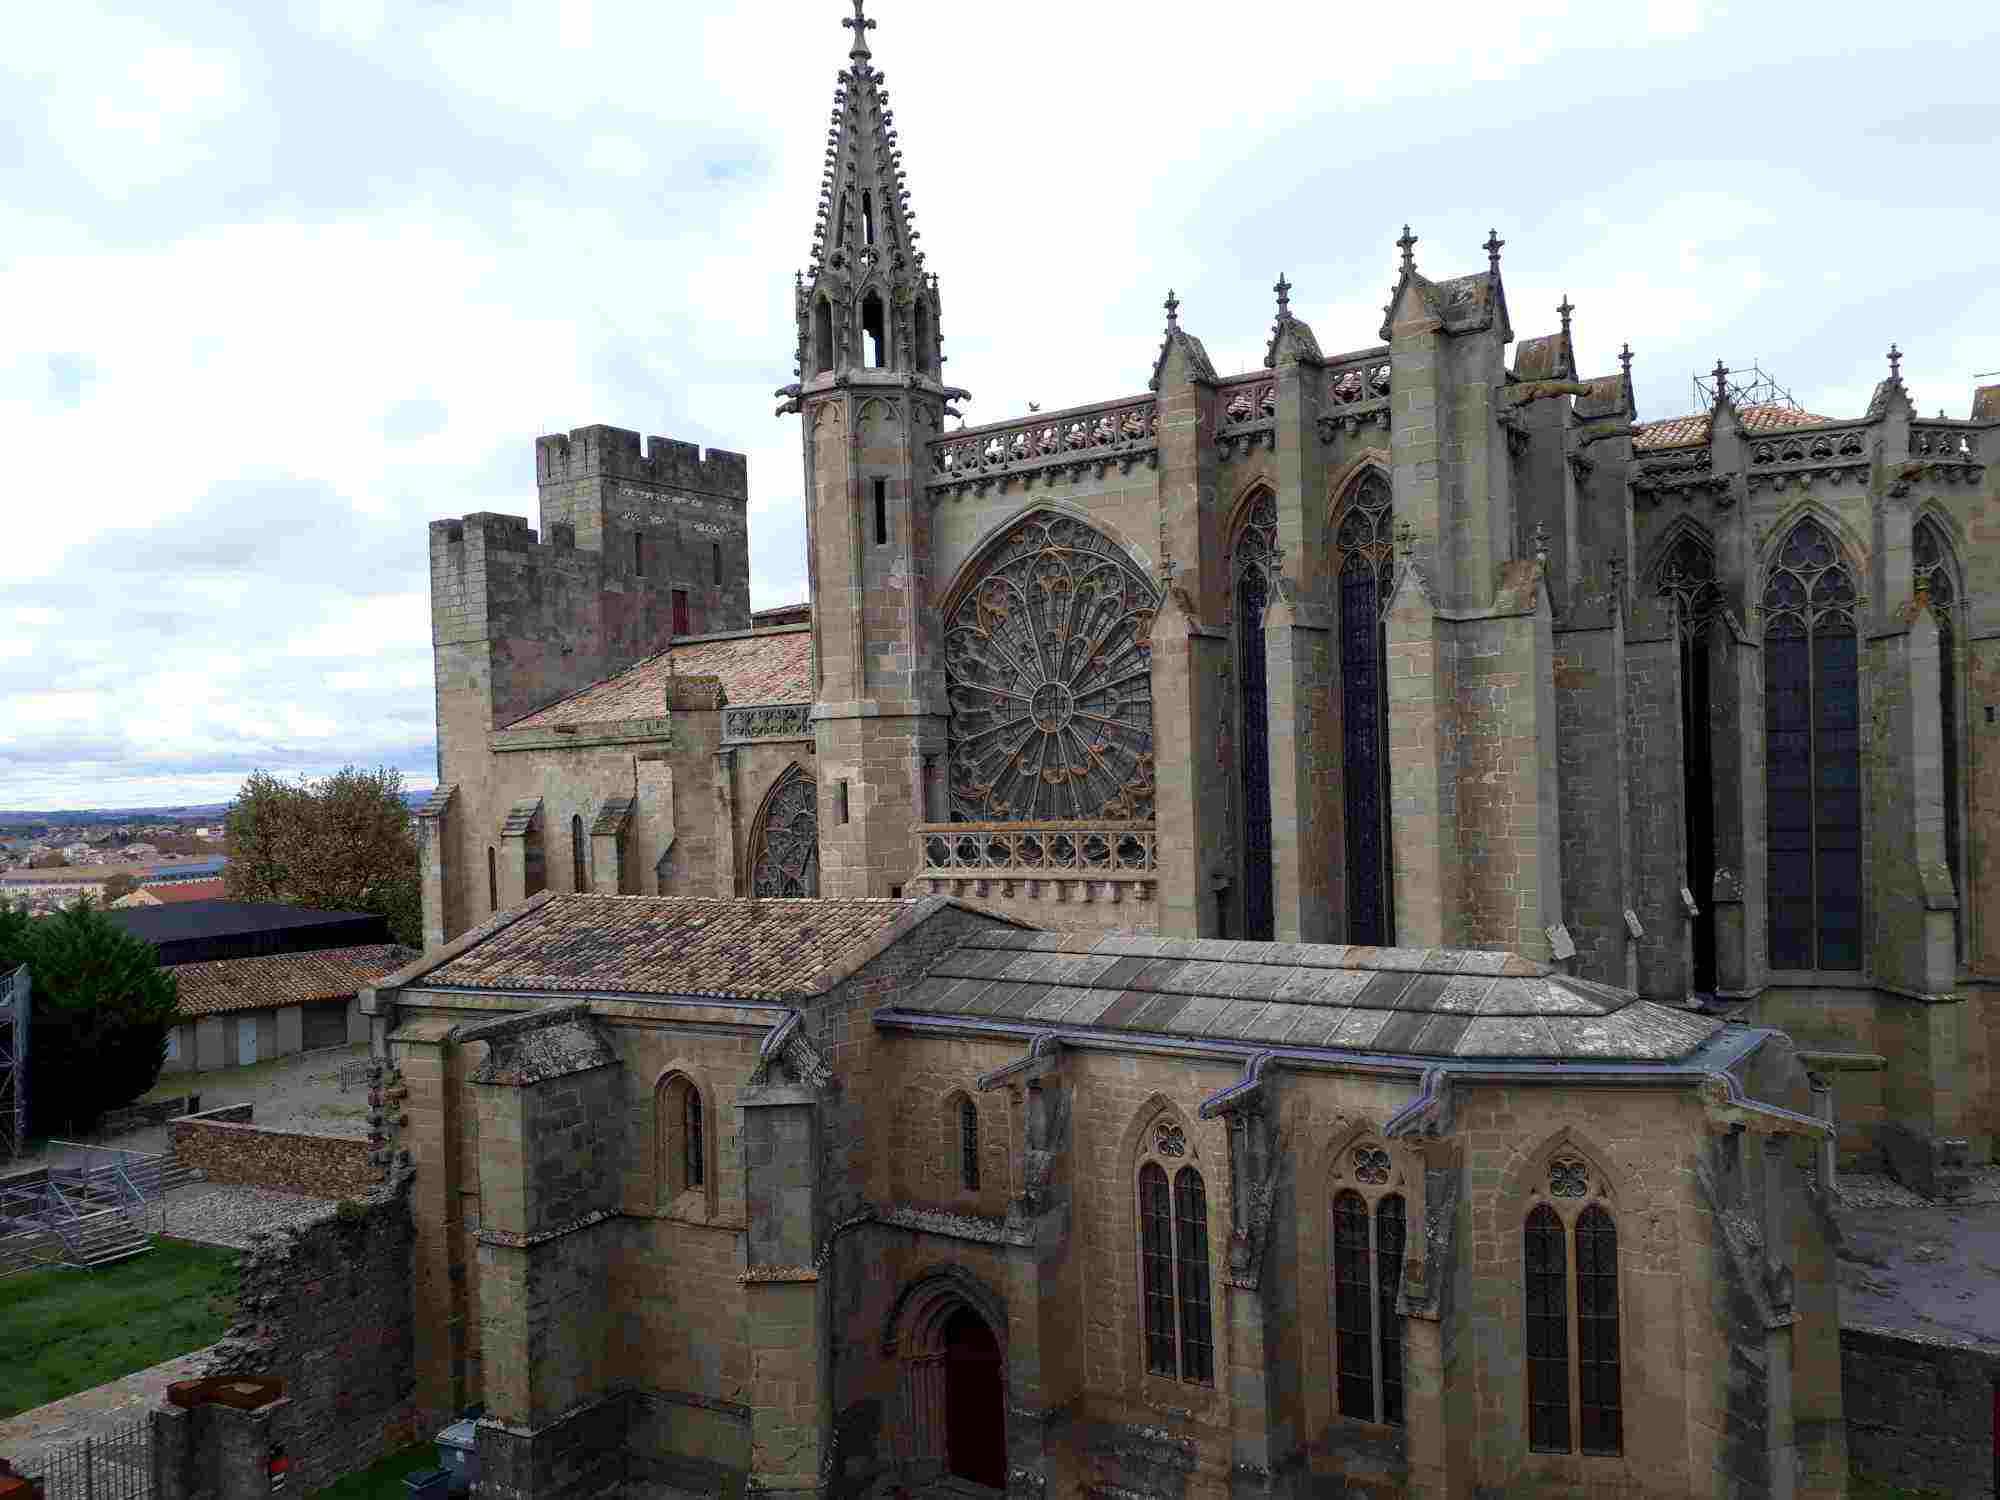 La Basílica de Saint-Nazaire de Carcassonne fue su catedral hasta 1801